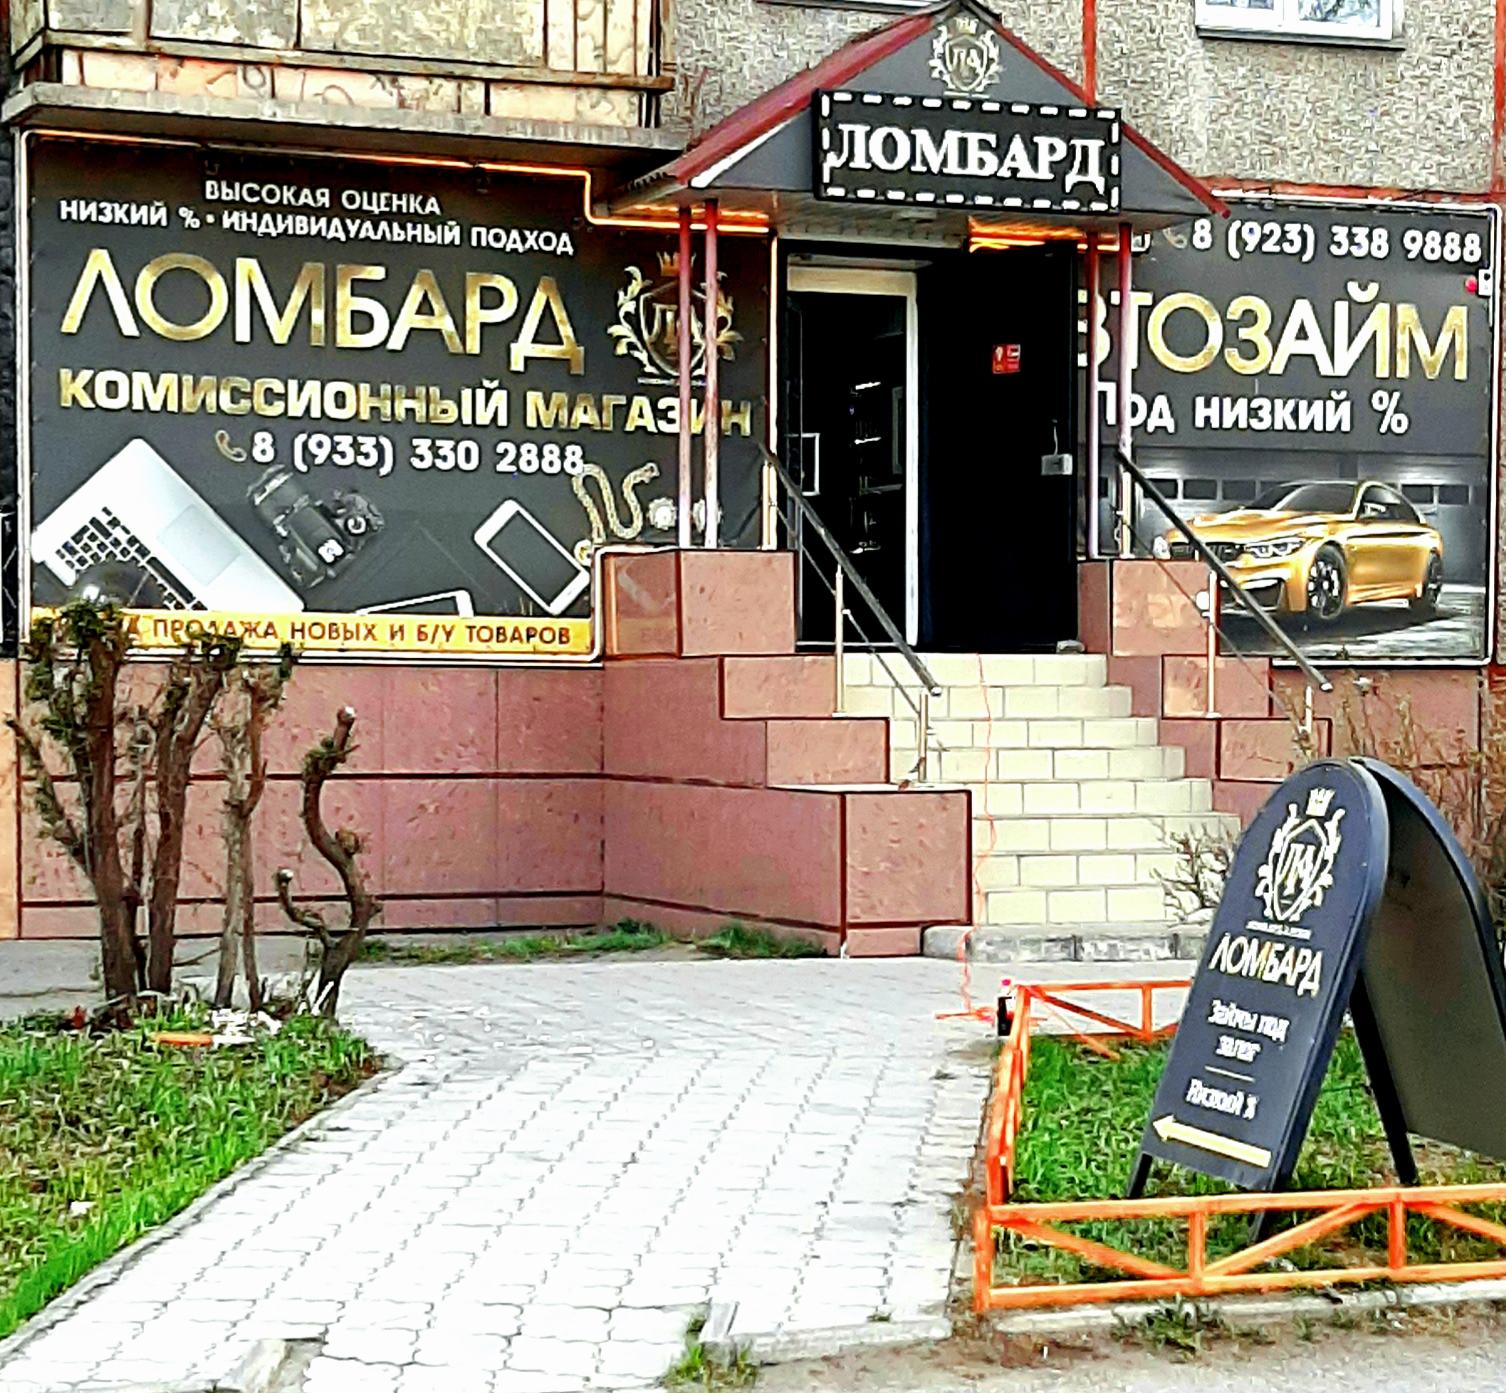 Оренбурга часовые ломбарды наручные ломбард спб часы